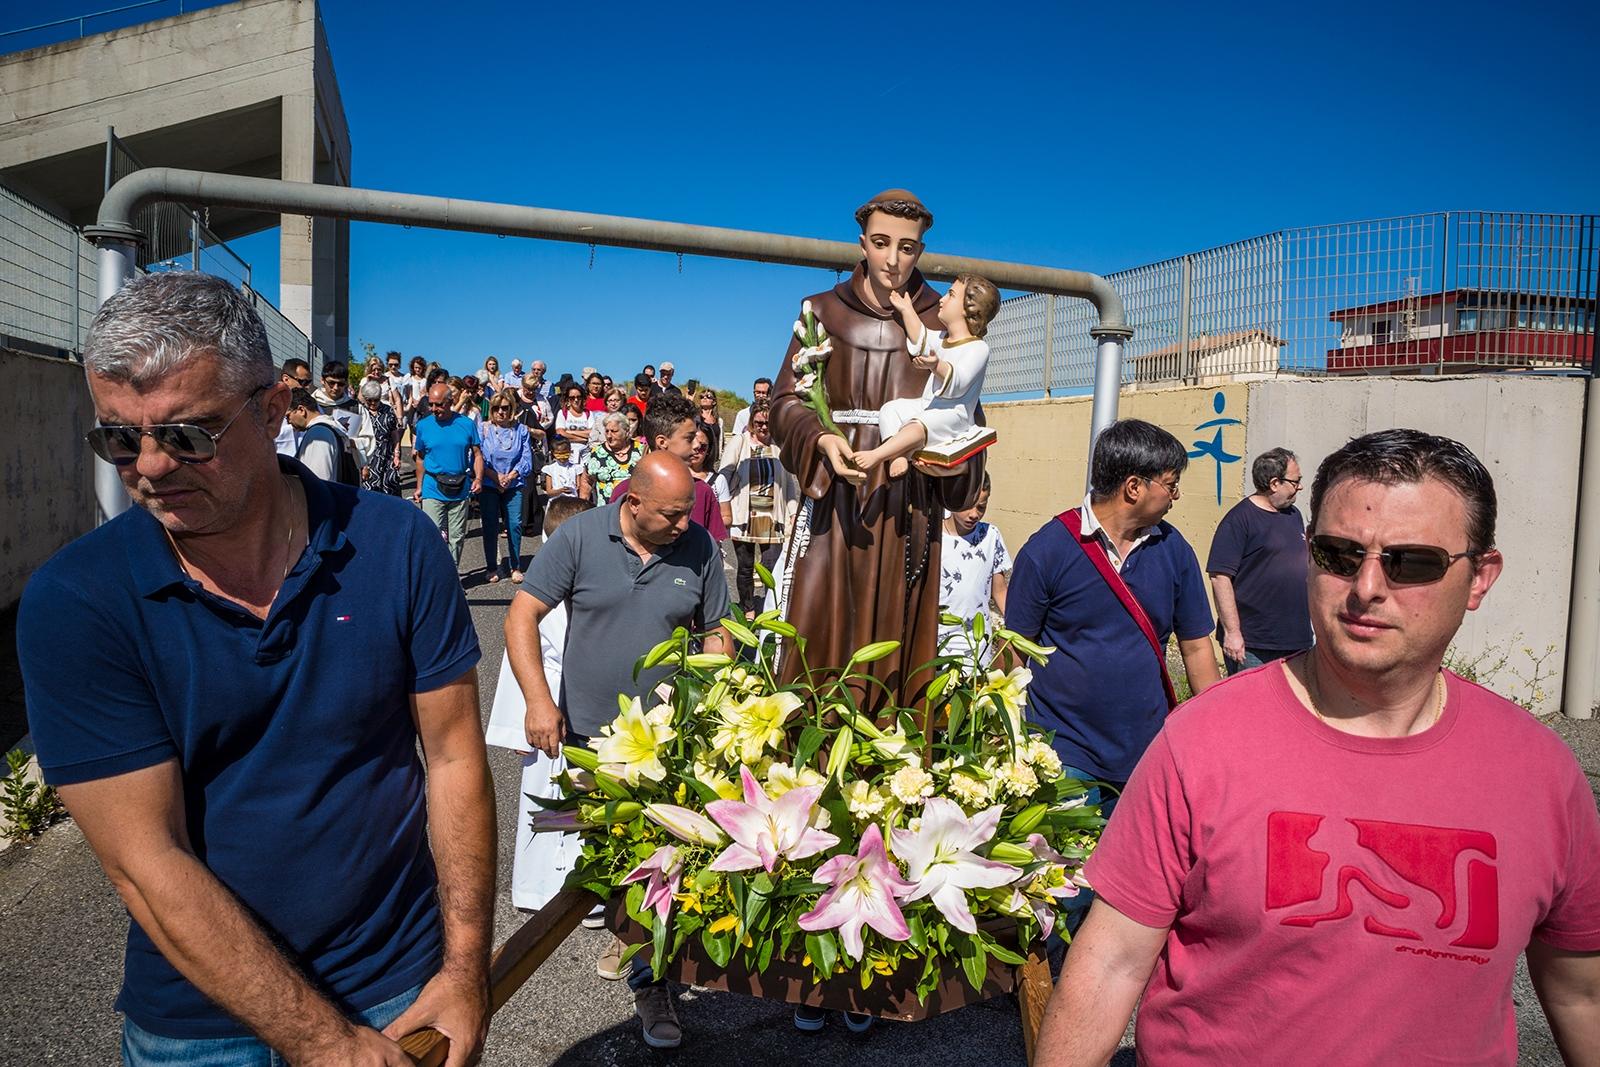 Celebration of the annual patron saint day